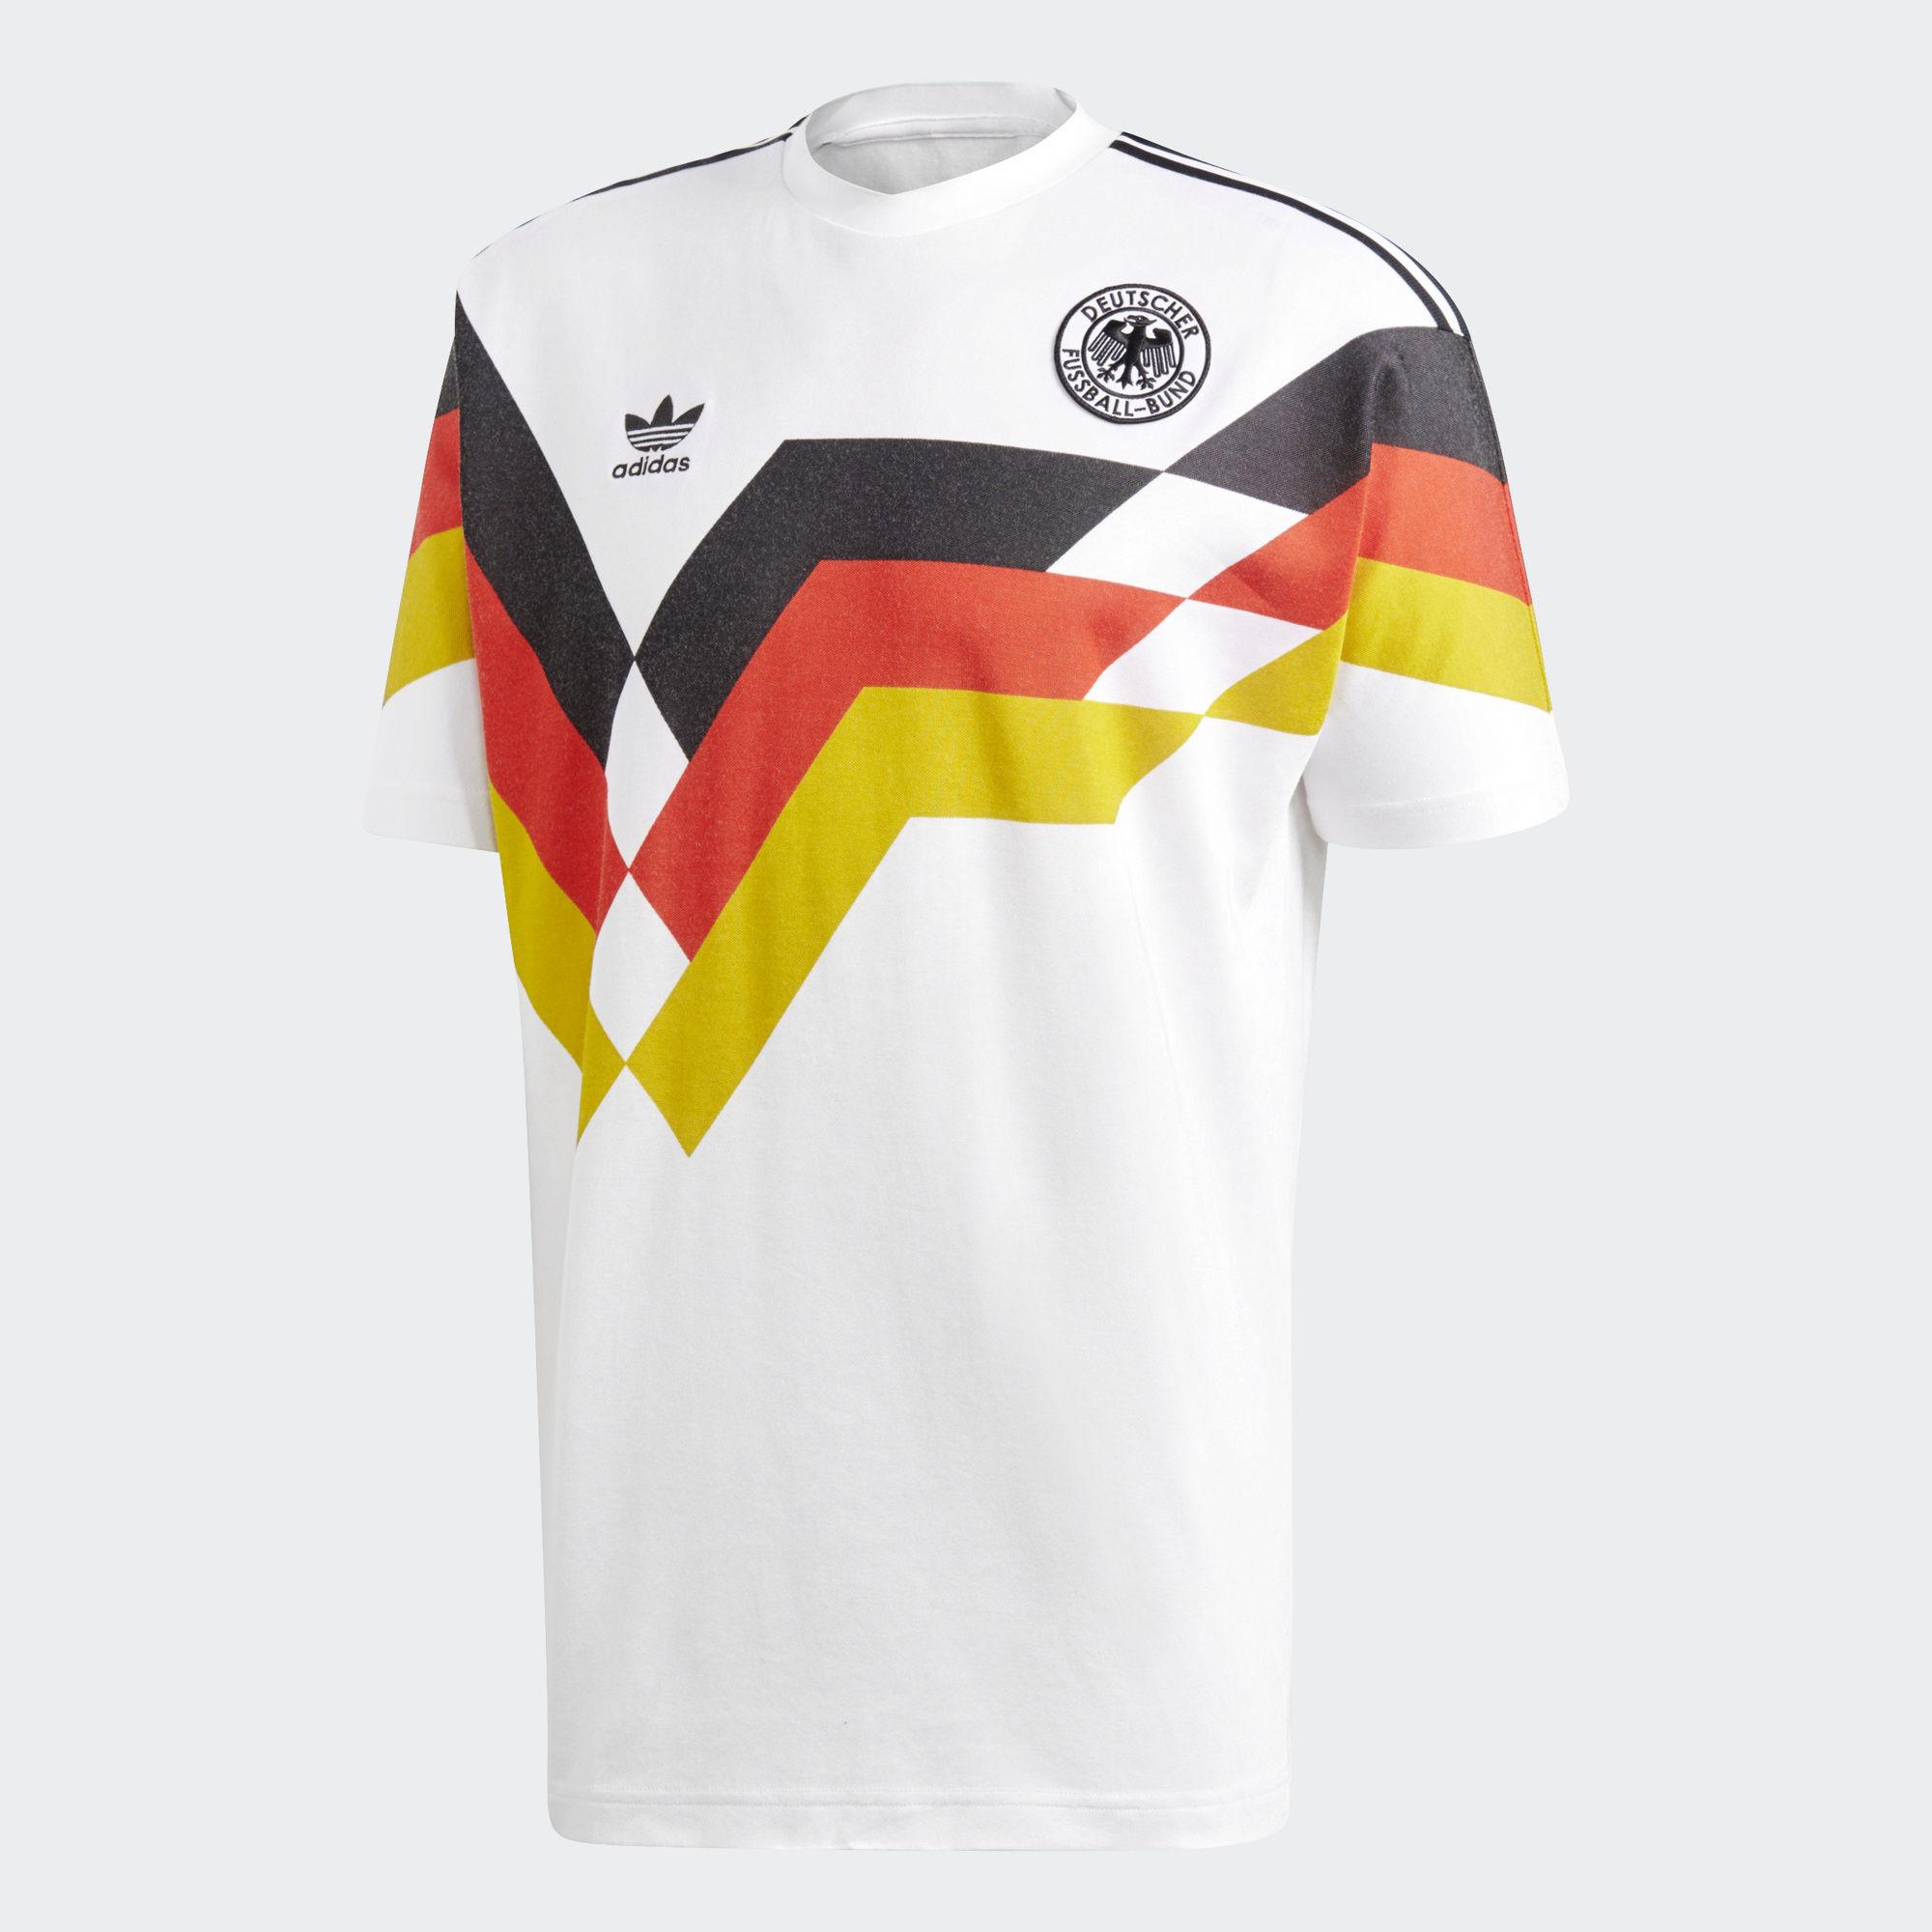 ... Click to enlarge image  germany 1990 adidas originals home replica jersey e.jpg ... 79c0d7fb6